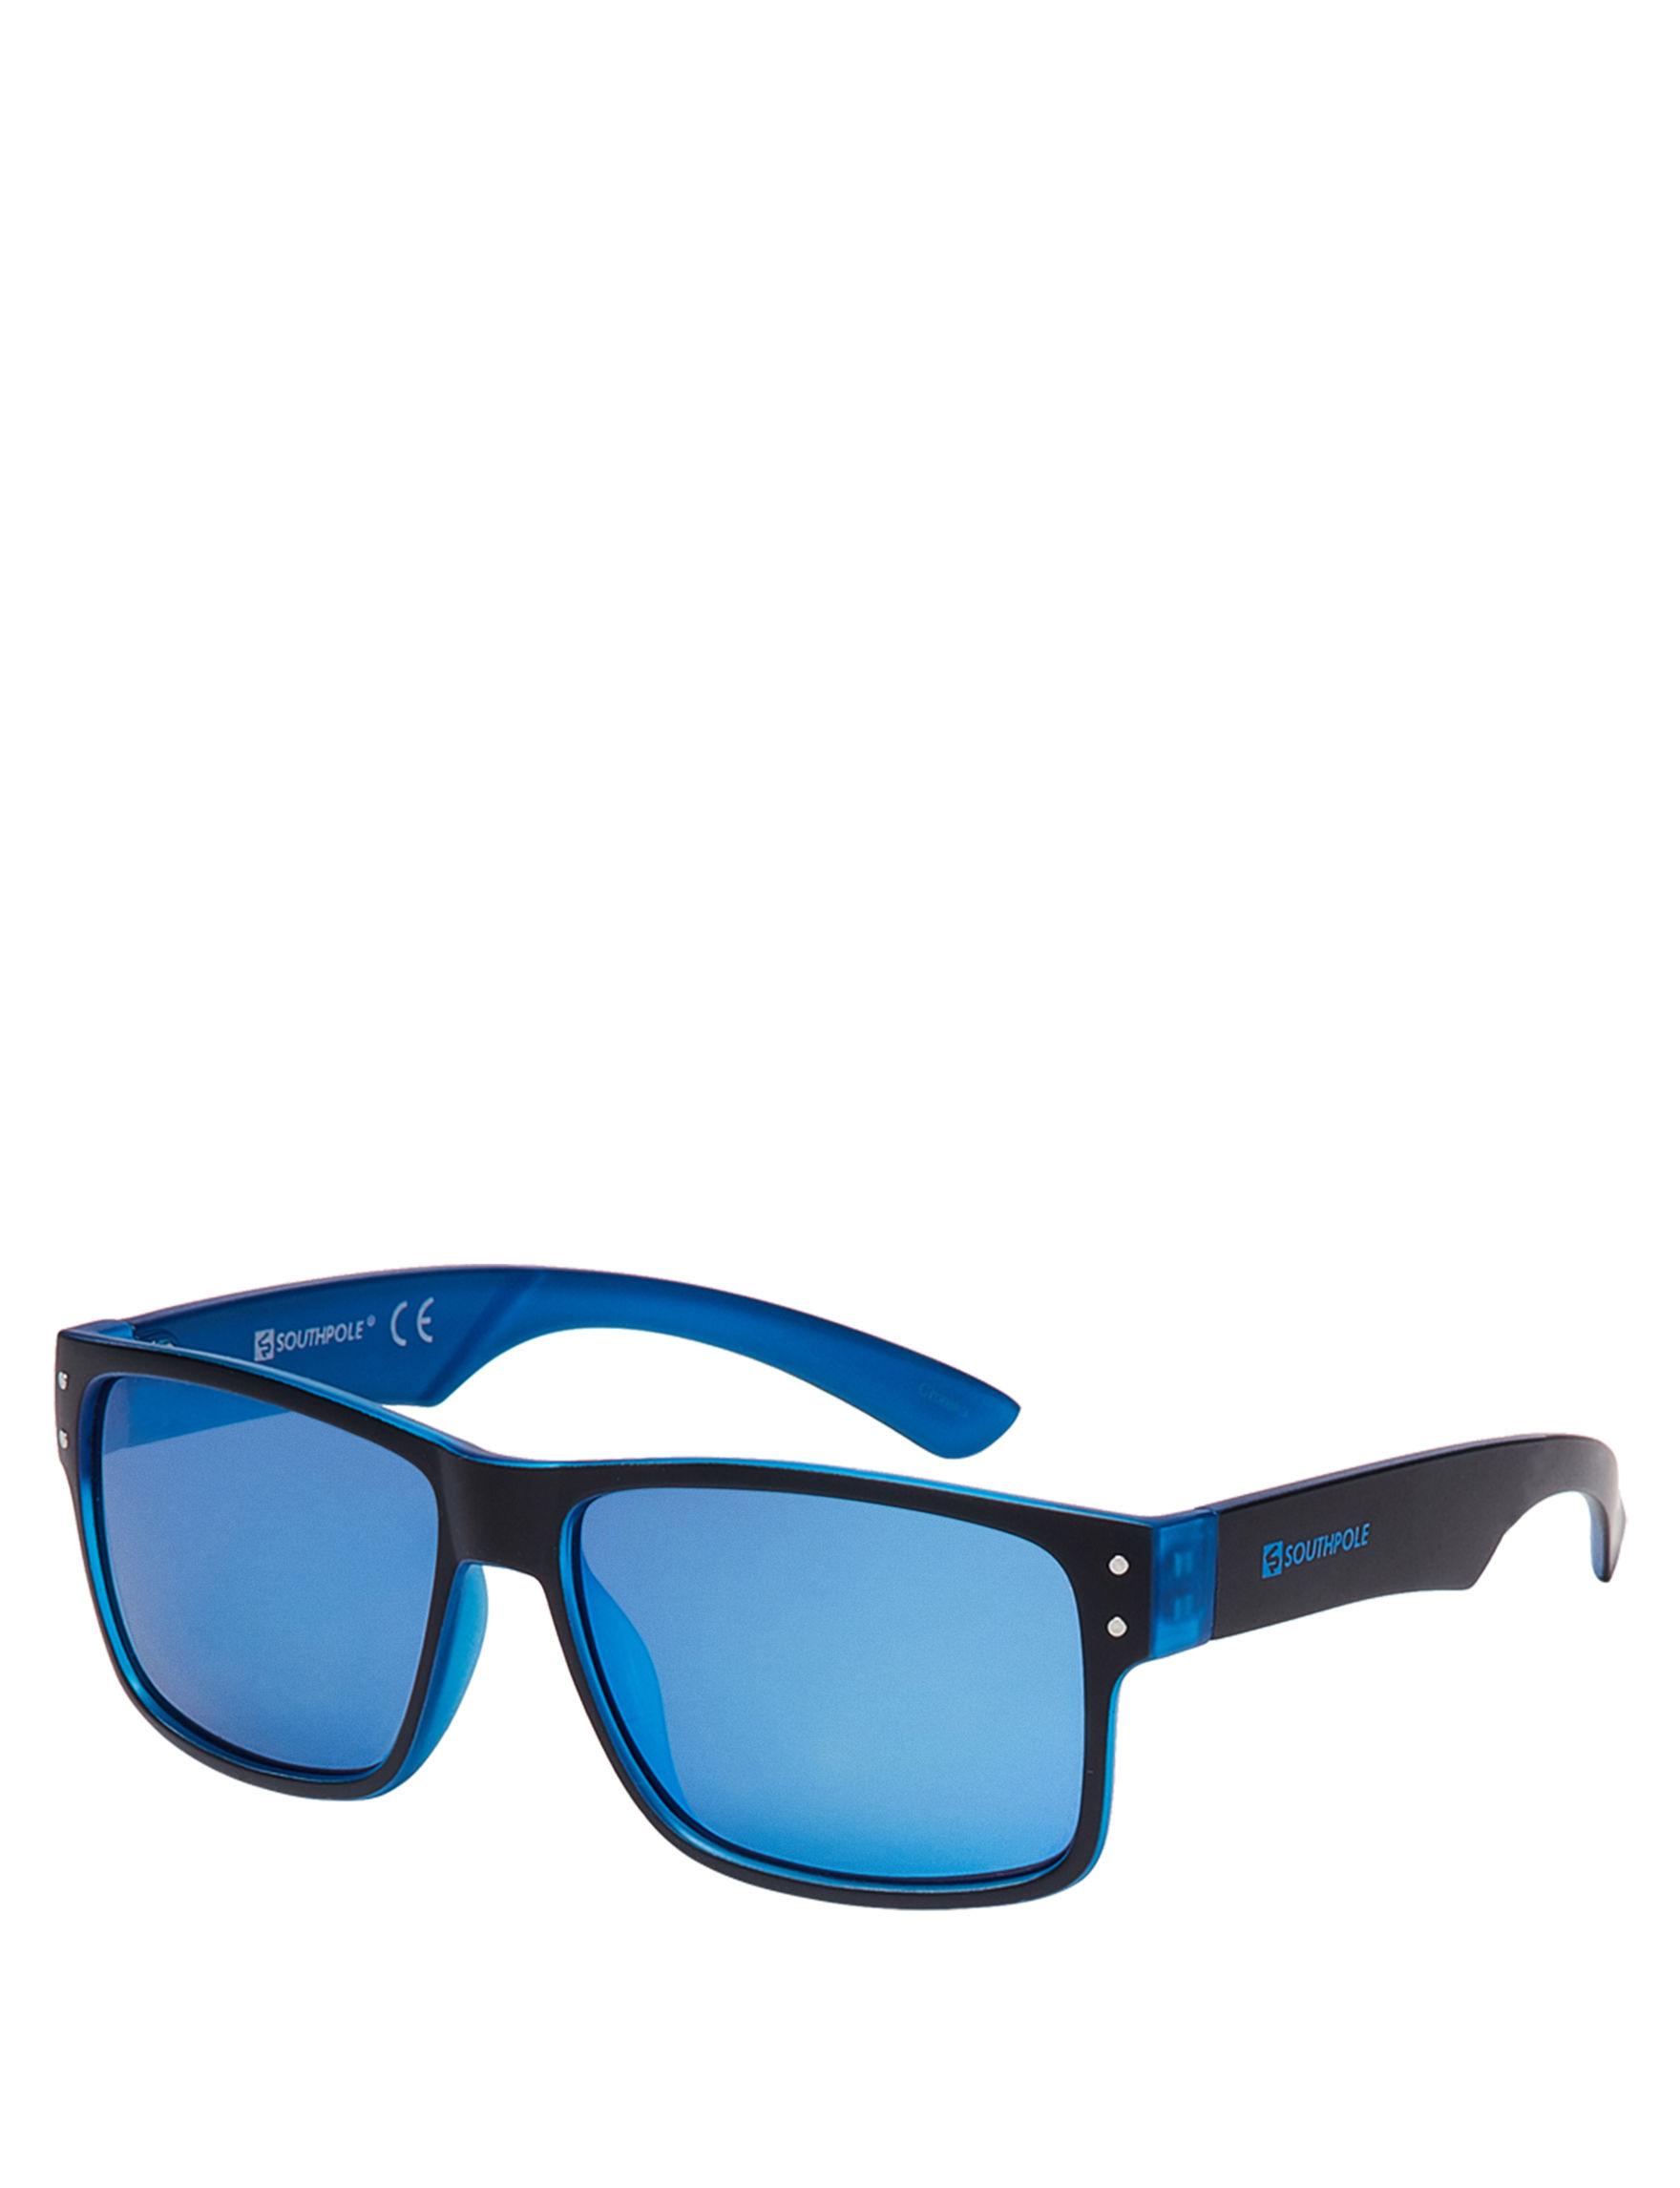 Southpole Black / Blue